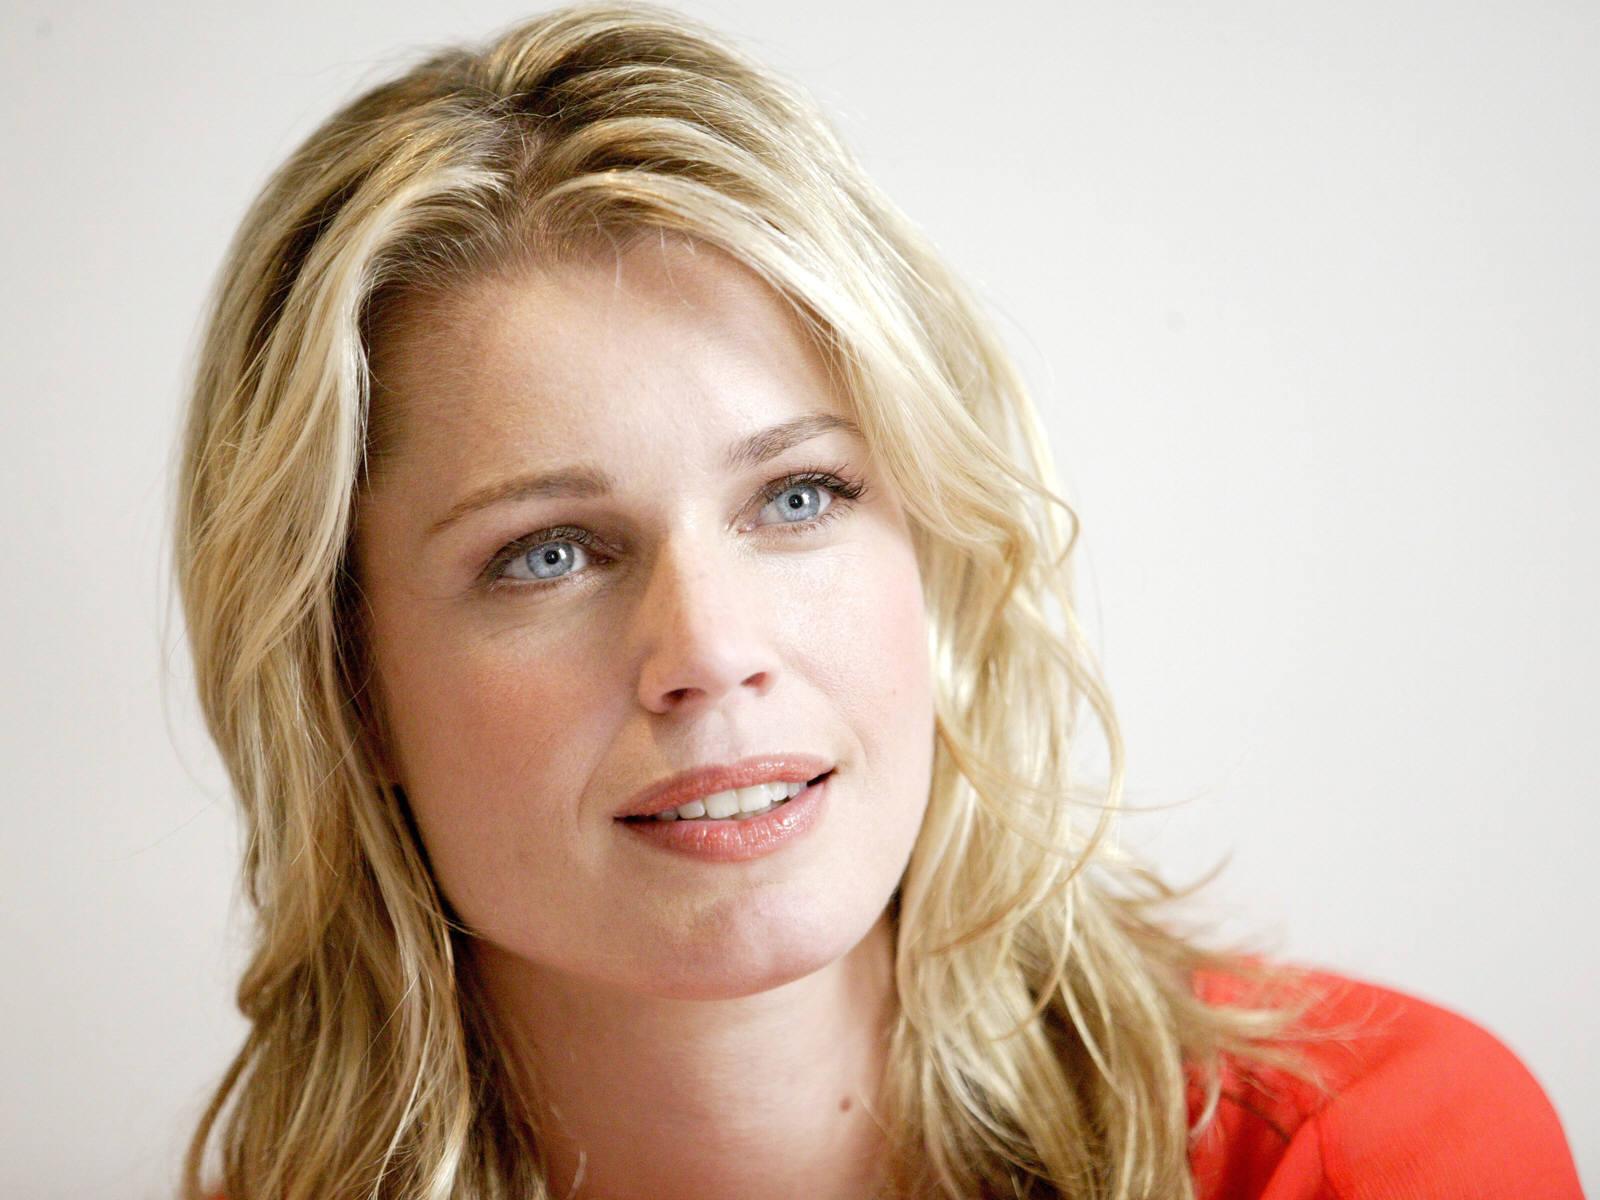 Rebecca Romijn Net Worth, Age, Height, Husband, Profile, Movies